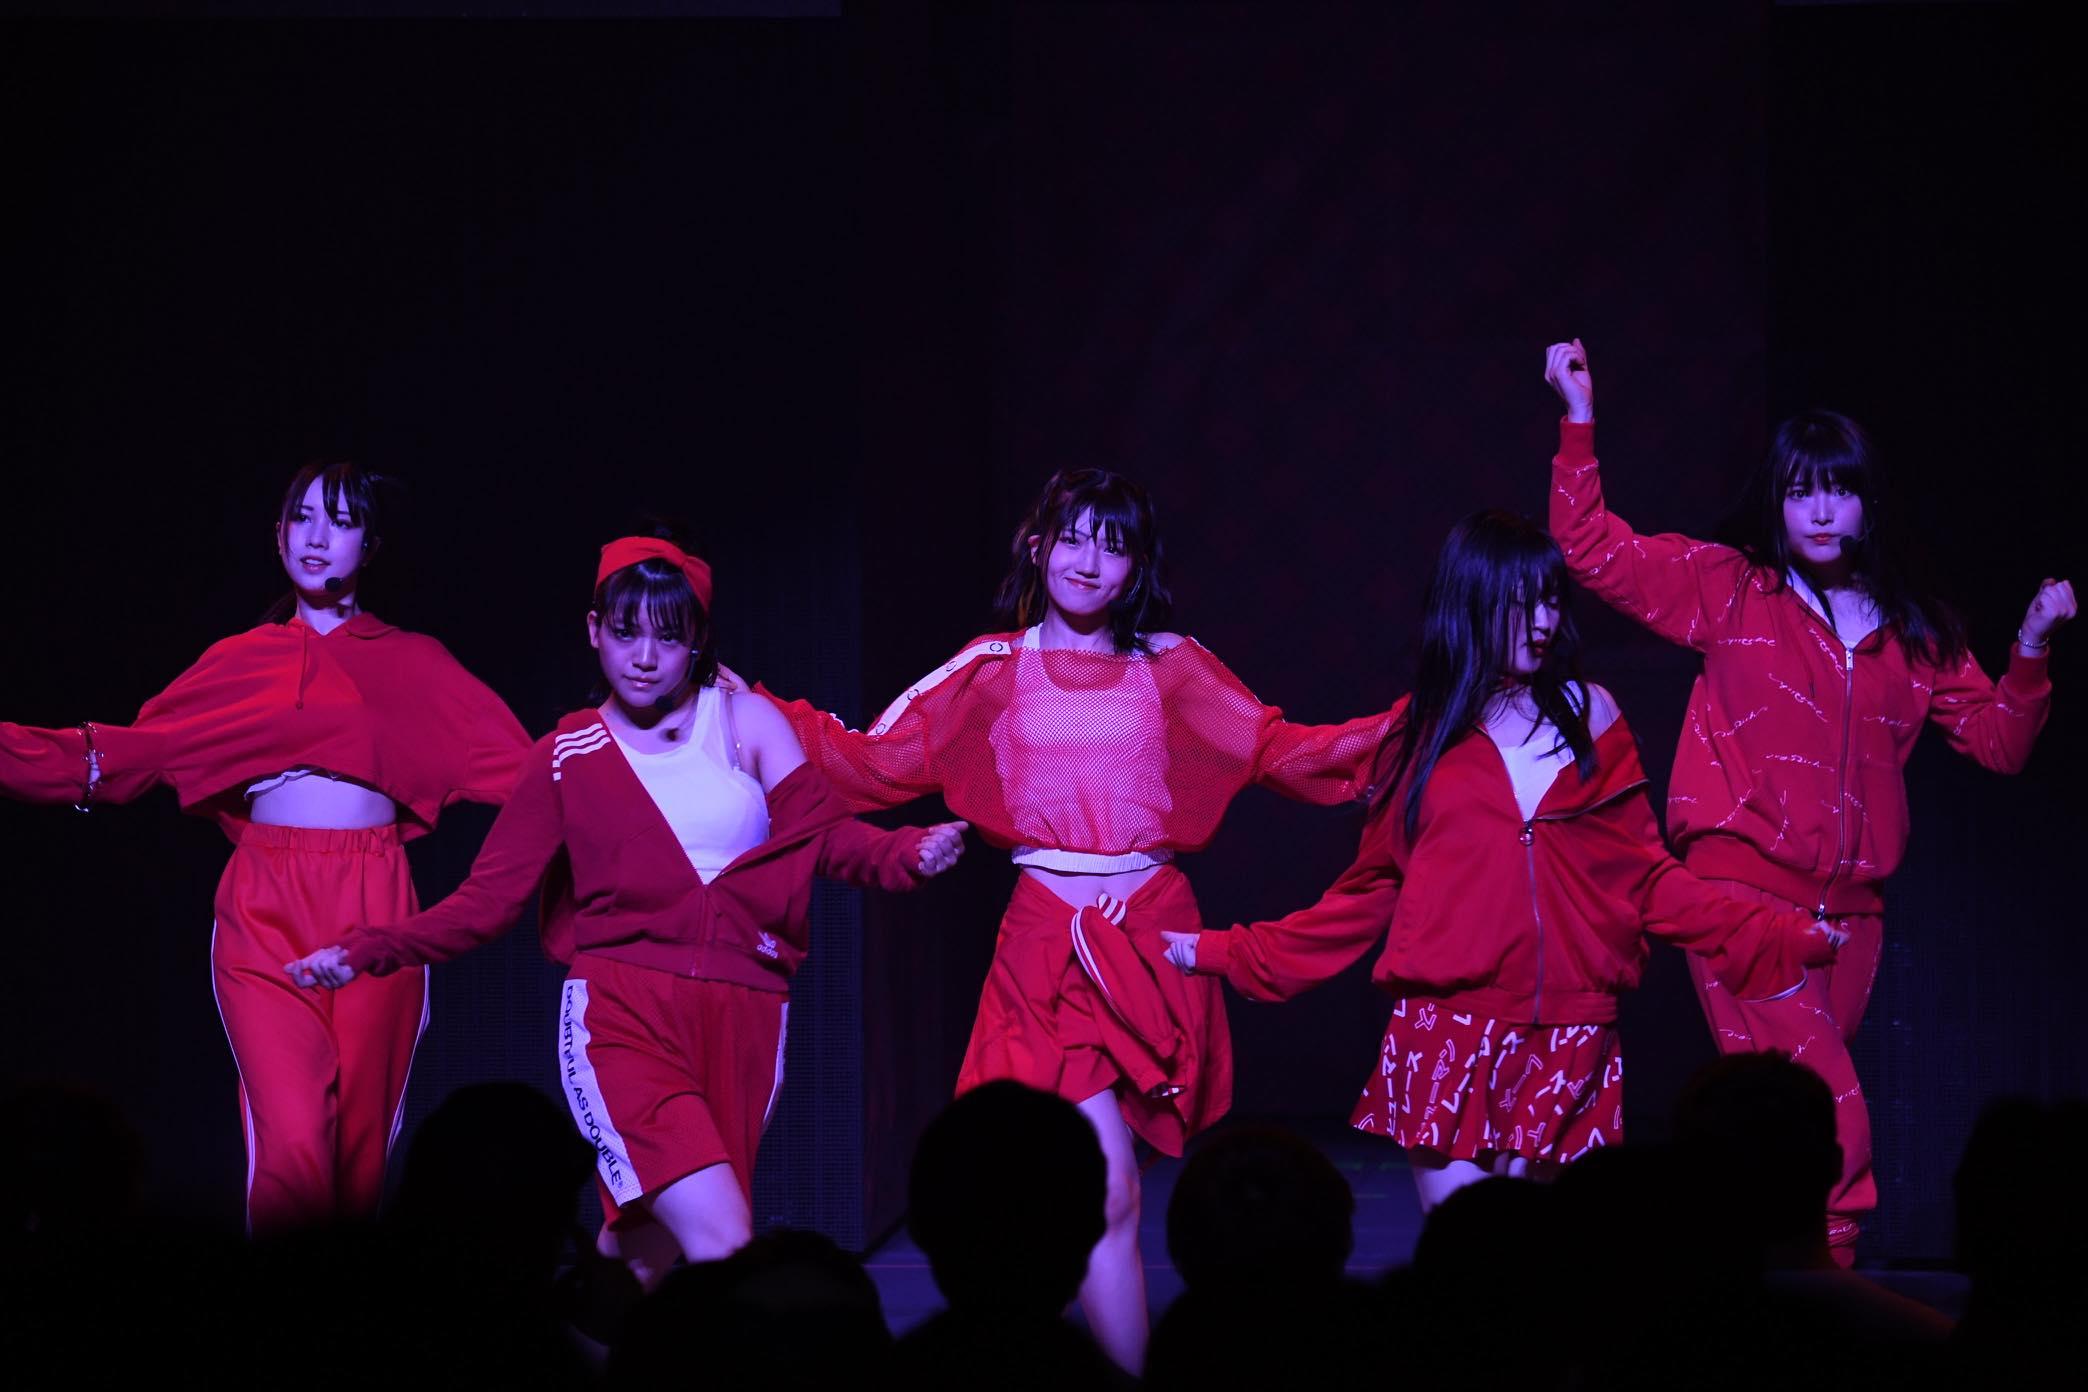 AKB48全国ツアー「神奈川公演」開催、チームBとチーム4のパワーが炸裂!【写真17枚】の画像012